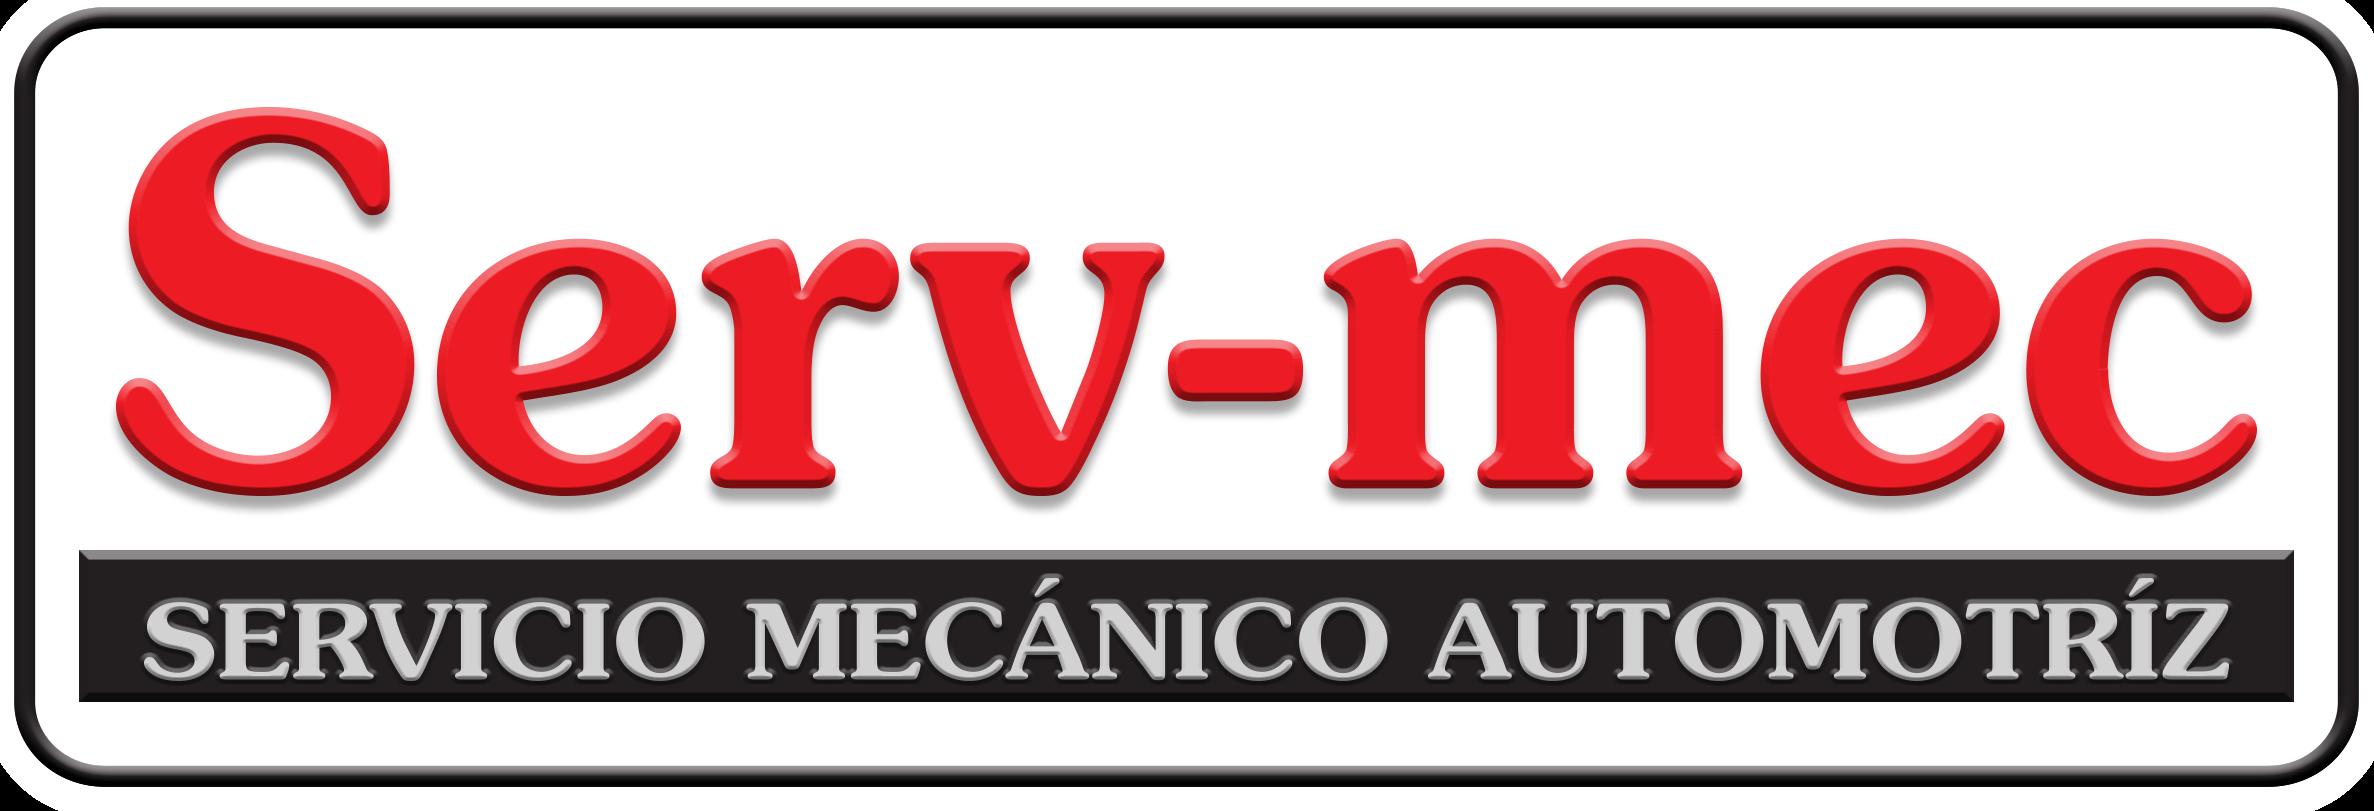 Servmec